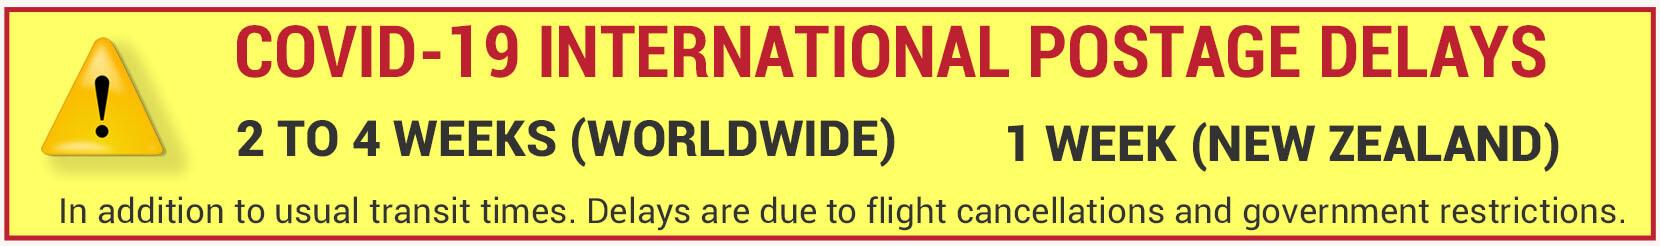 Covid delays - NZ - 1 week - worldwide 2 to 4 weeks